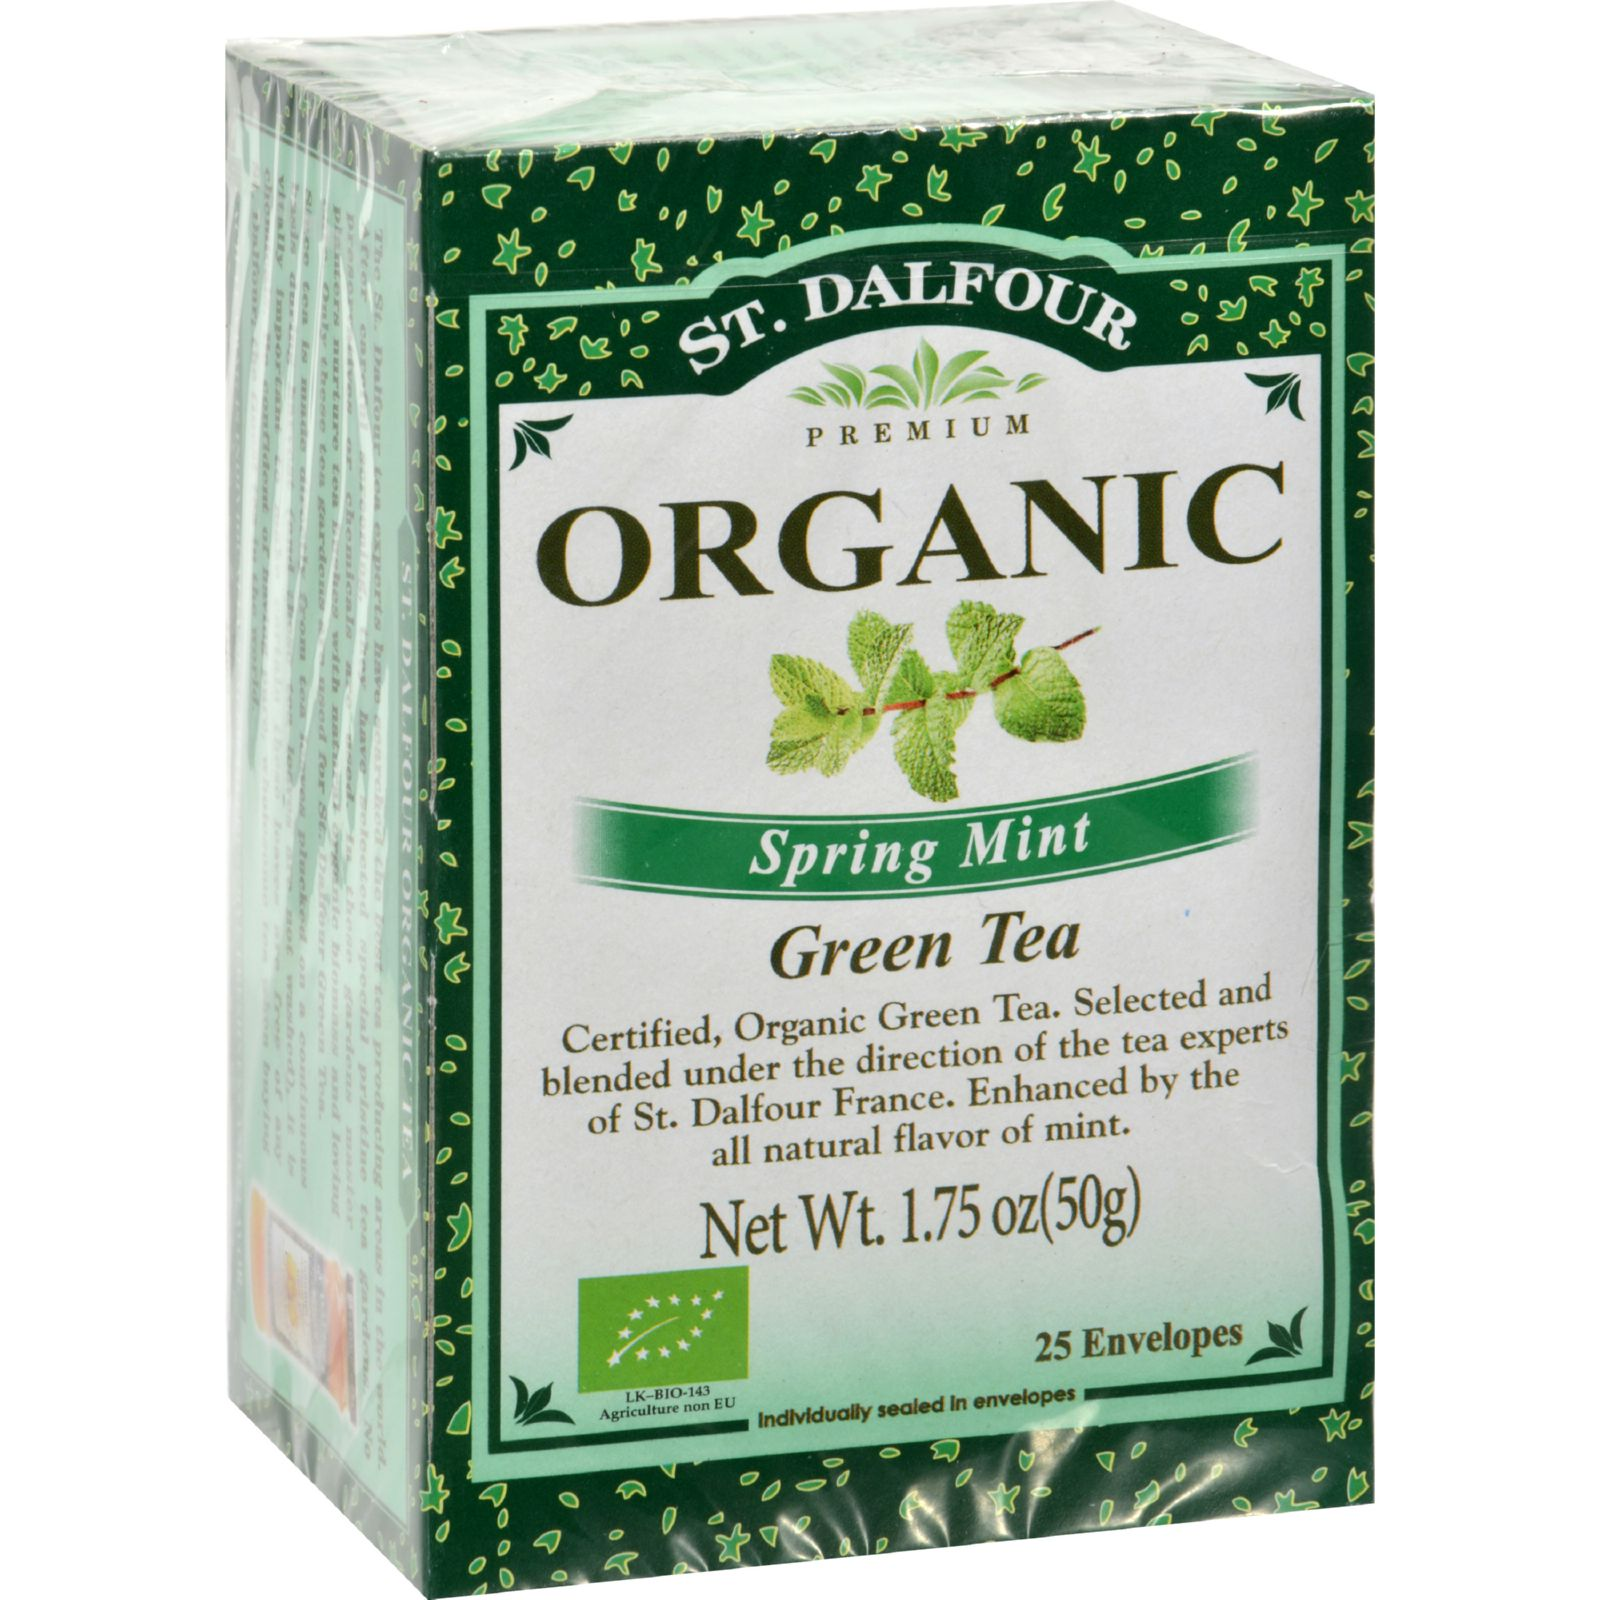 St Dalfour Organic Green Tea Spring Mint - 25 Tea Bags - Case